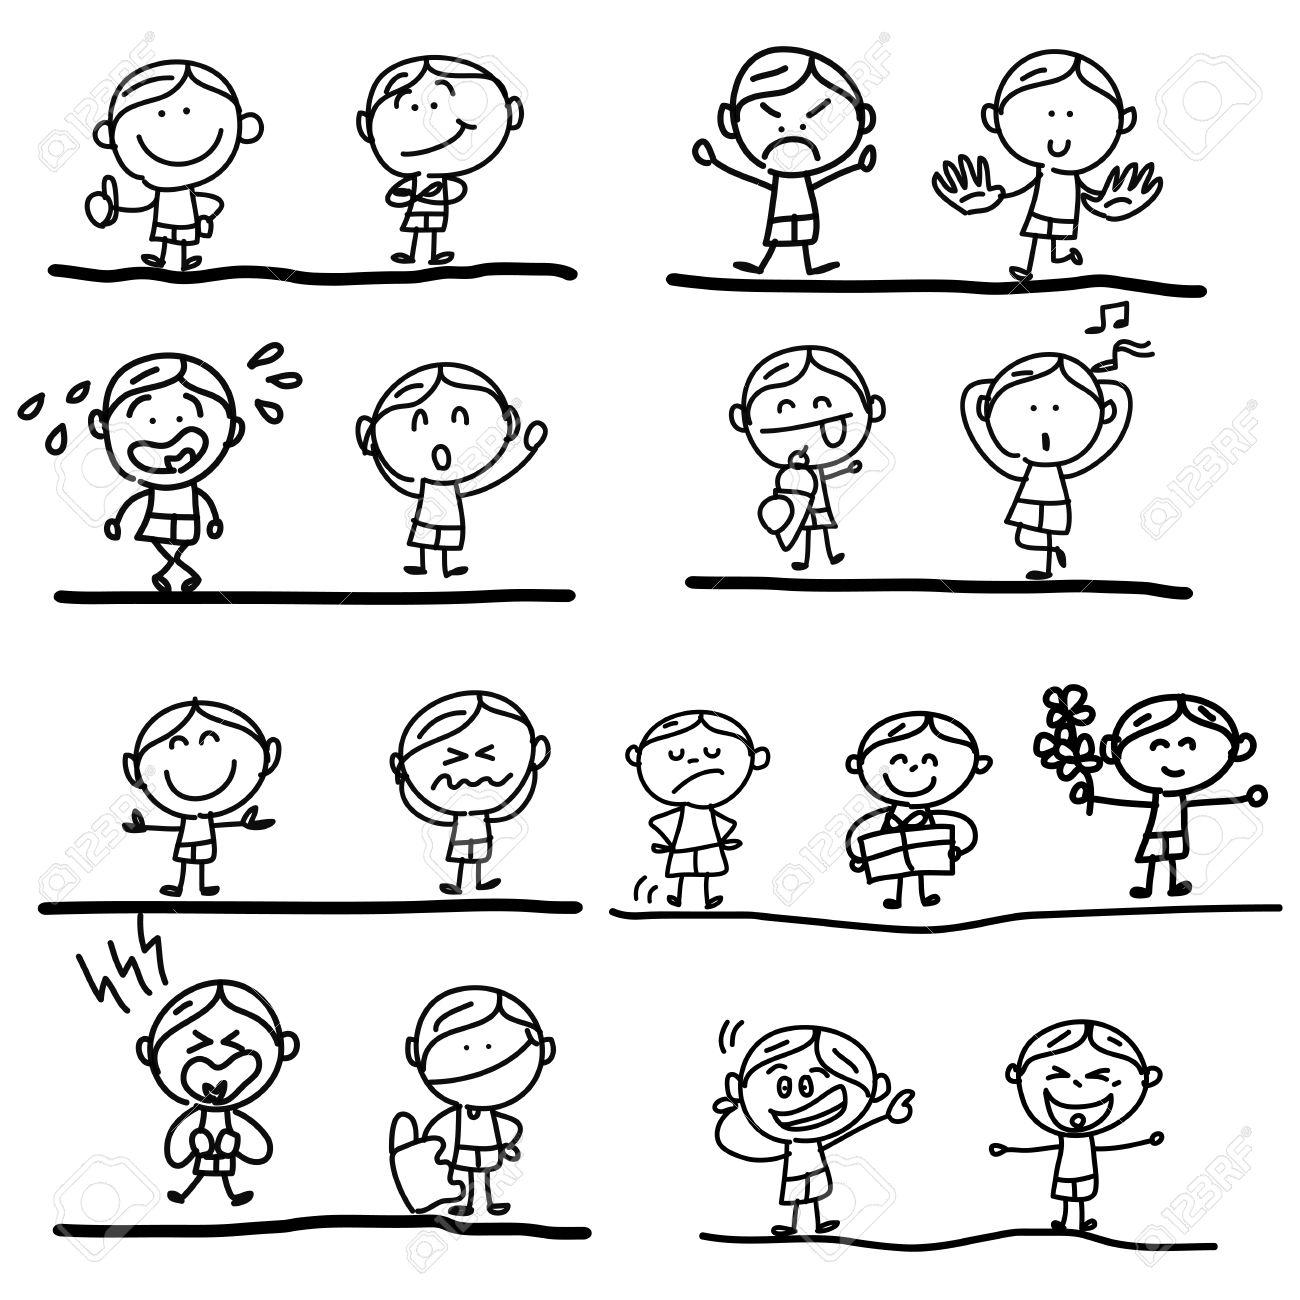 1300x1300 Hand Drawing Cartoon Emotions Royalty Free Cliparts, Vectors,